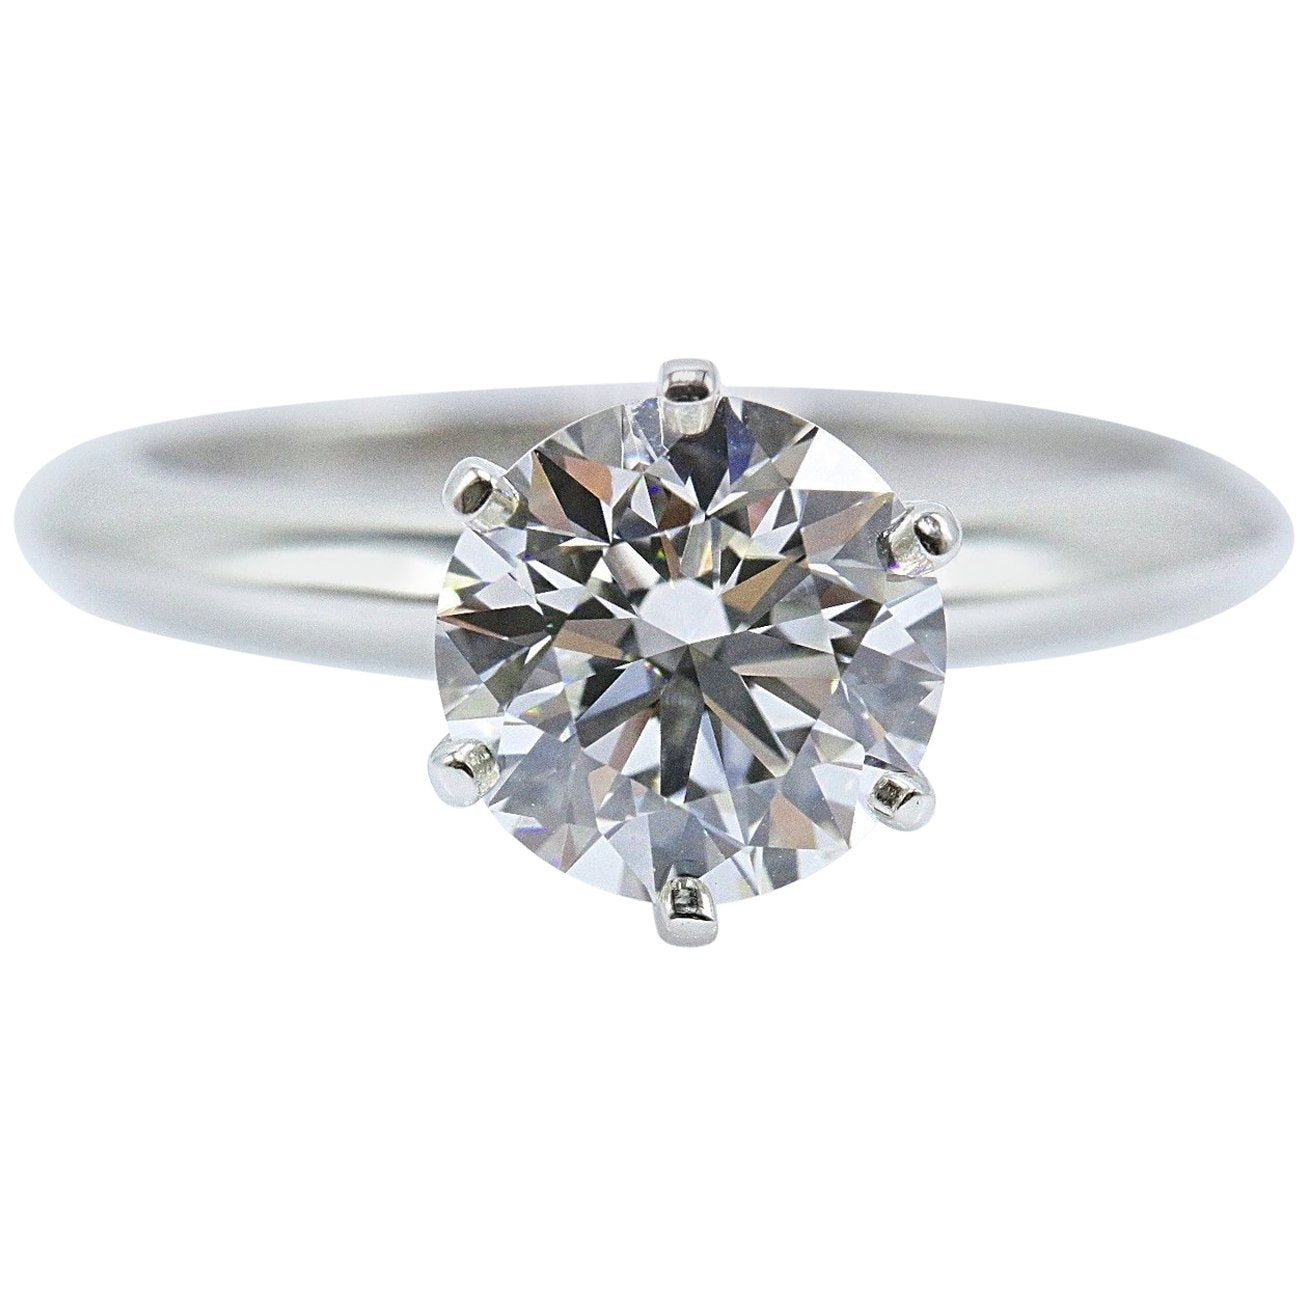 Tiffany & Co. Round Brilliant Diamond Engagement Ring 1.68 Carat G VVS2 Platinum